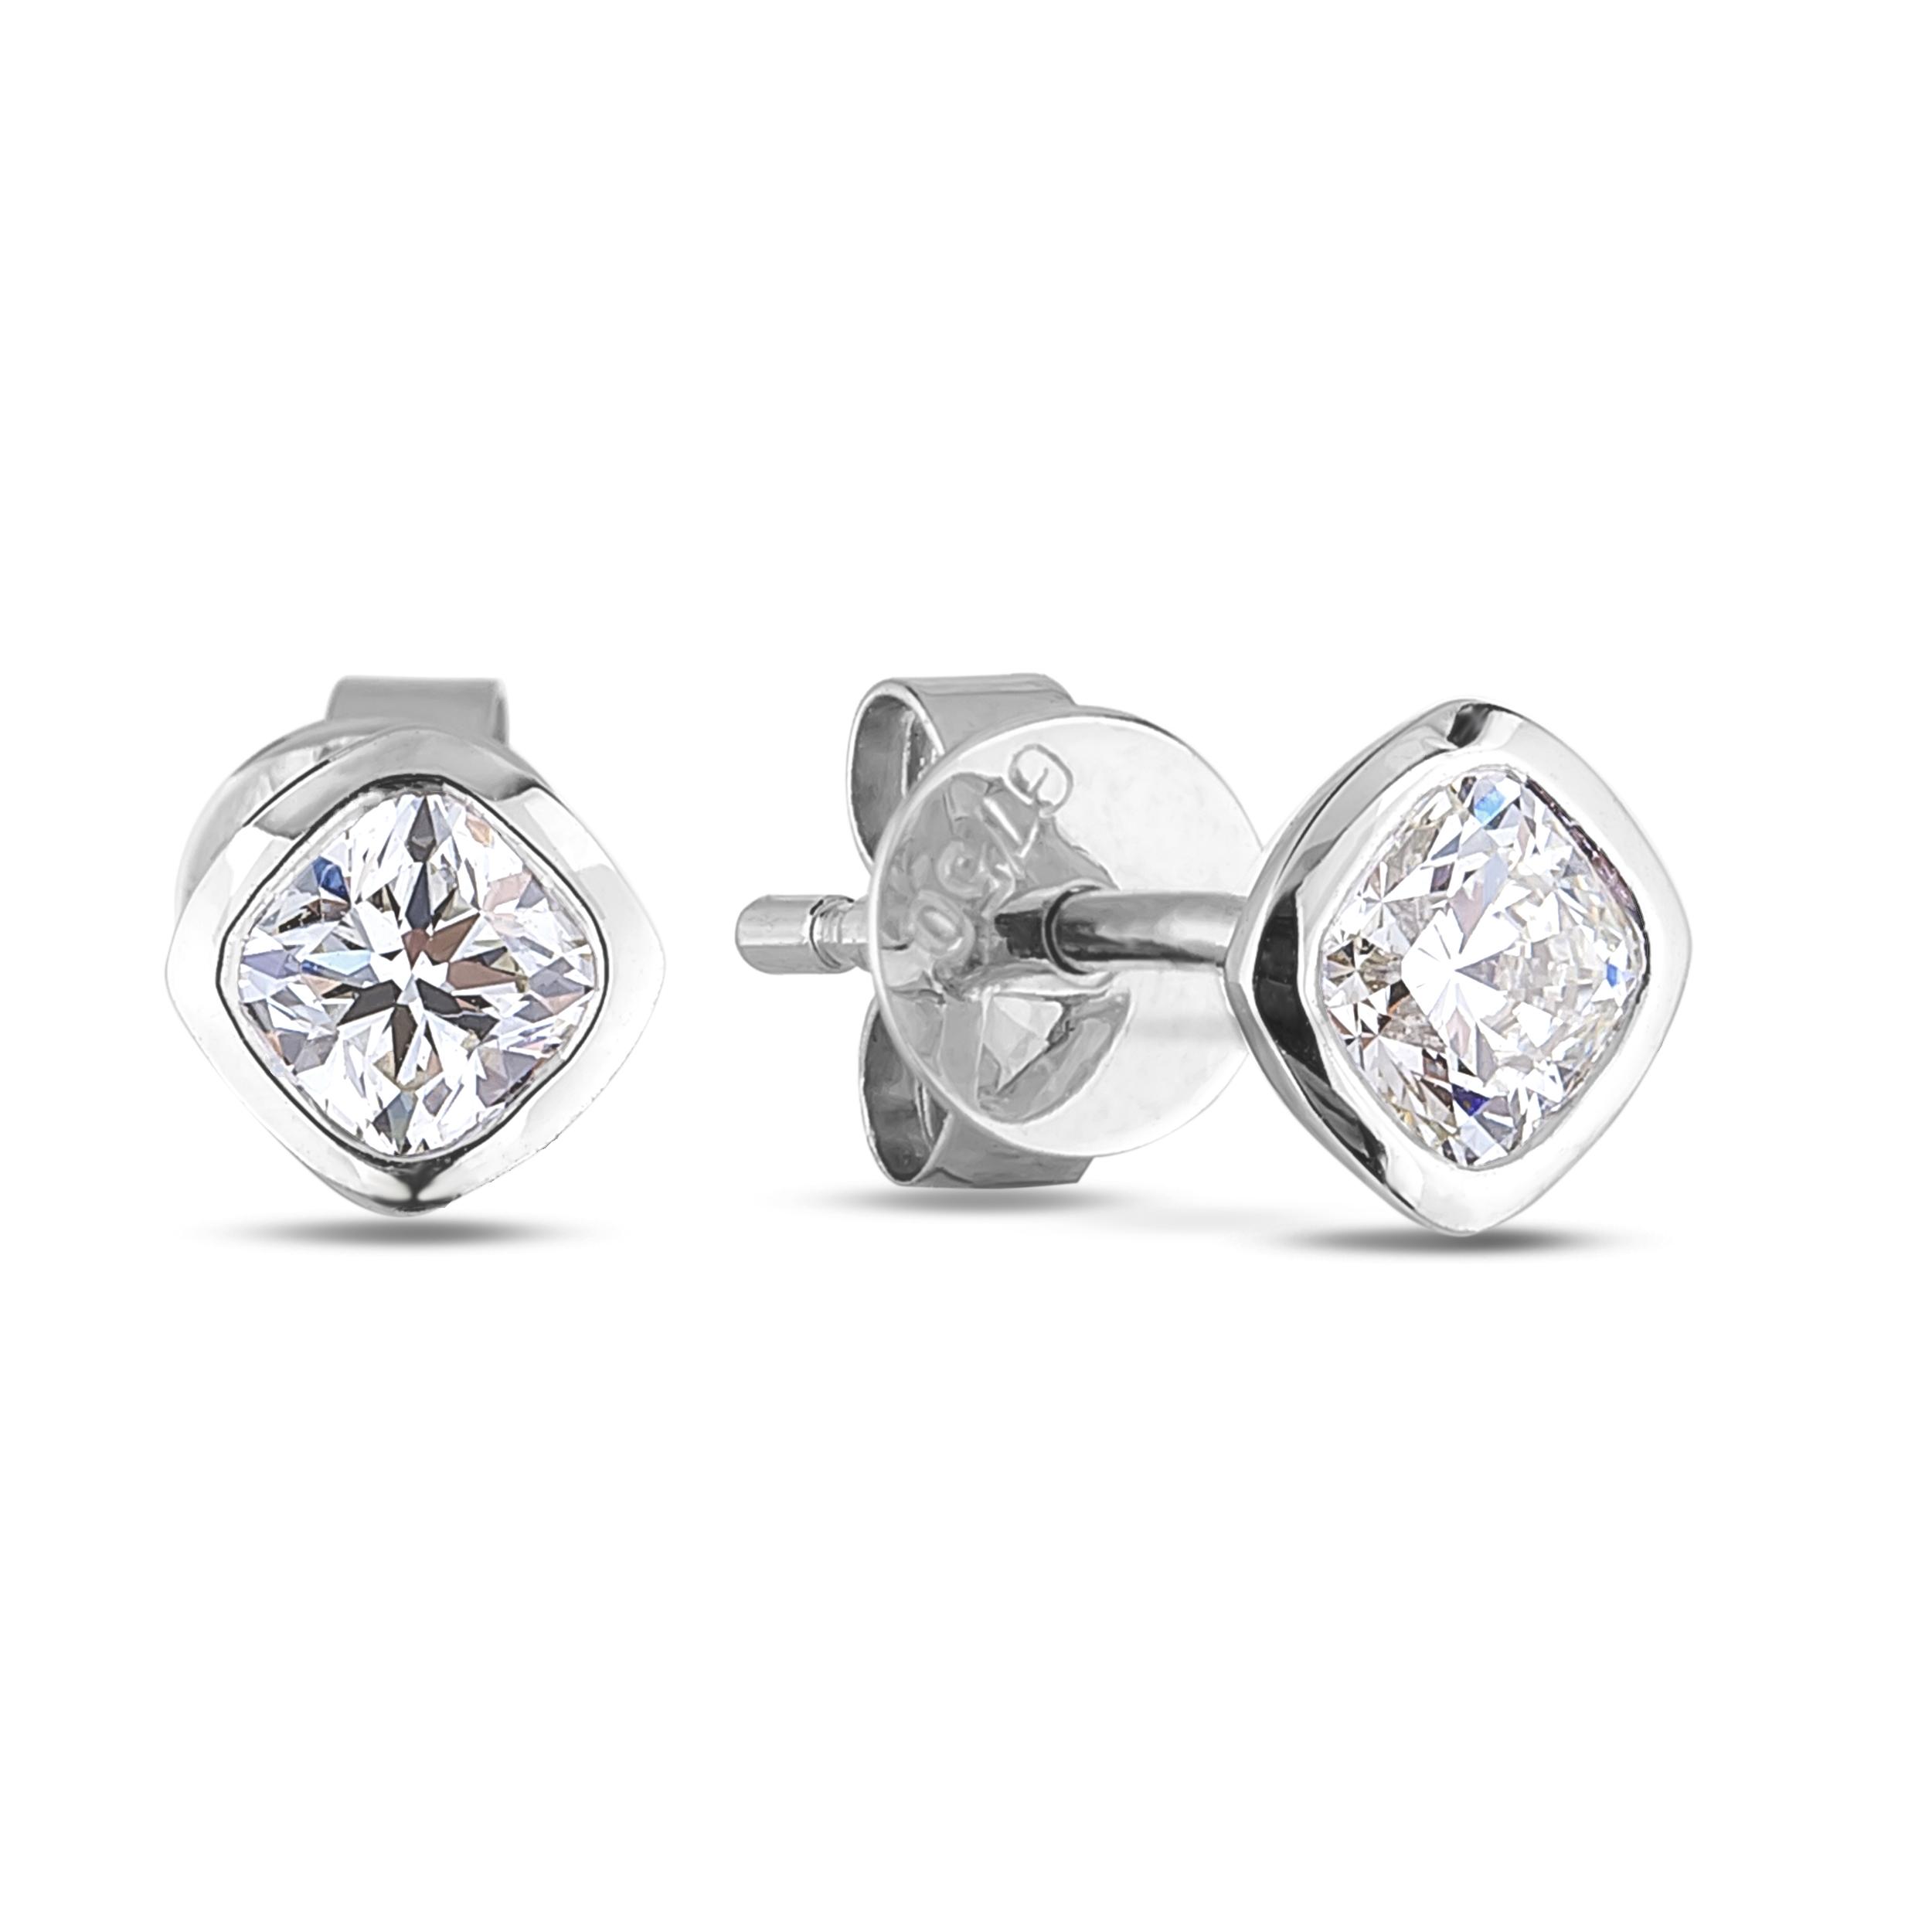 Diamond Stud Earrings SGE328 (Earrings)